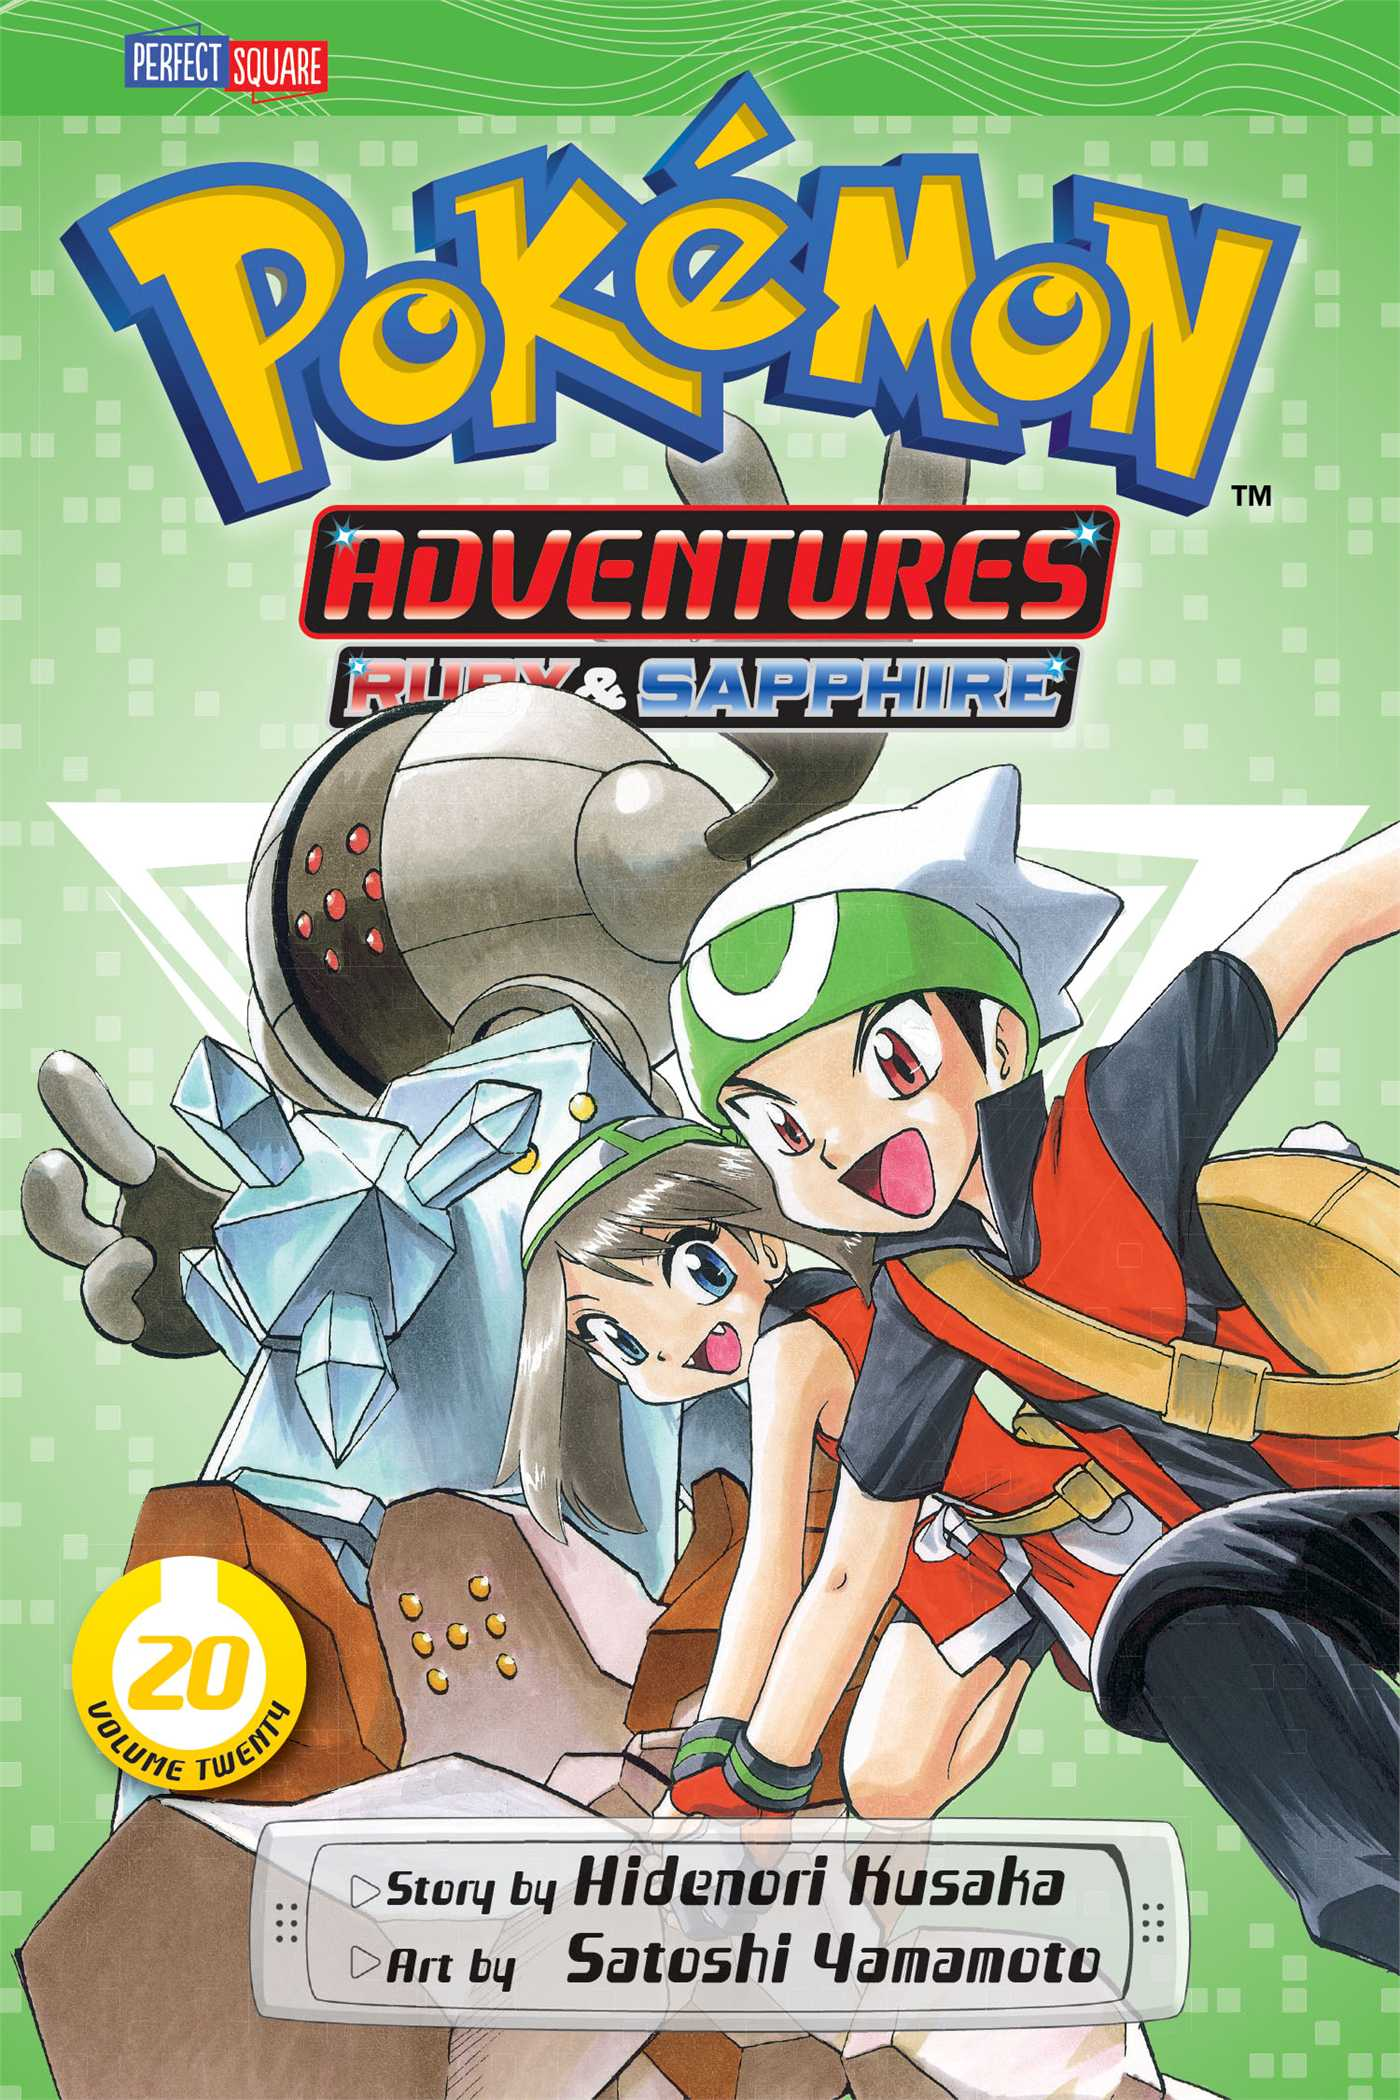 Pokémon Adventures: Black and White, Vol. 2 by Hidenori